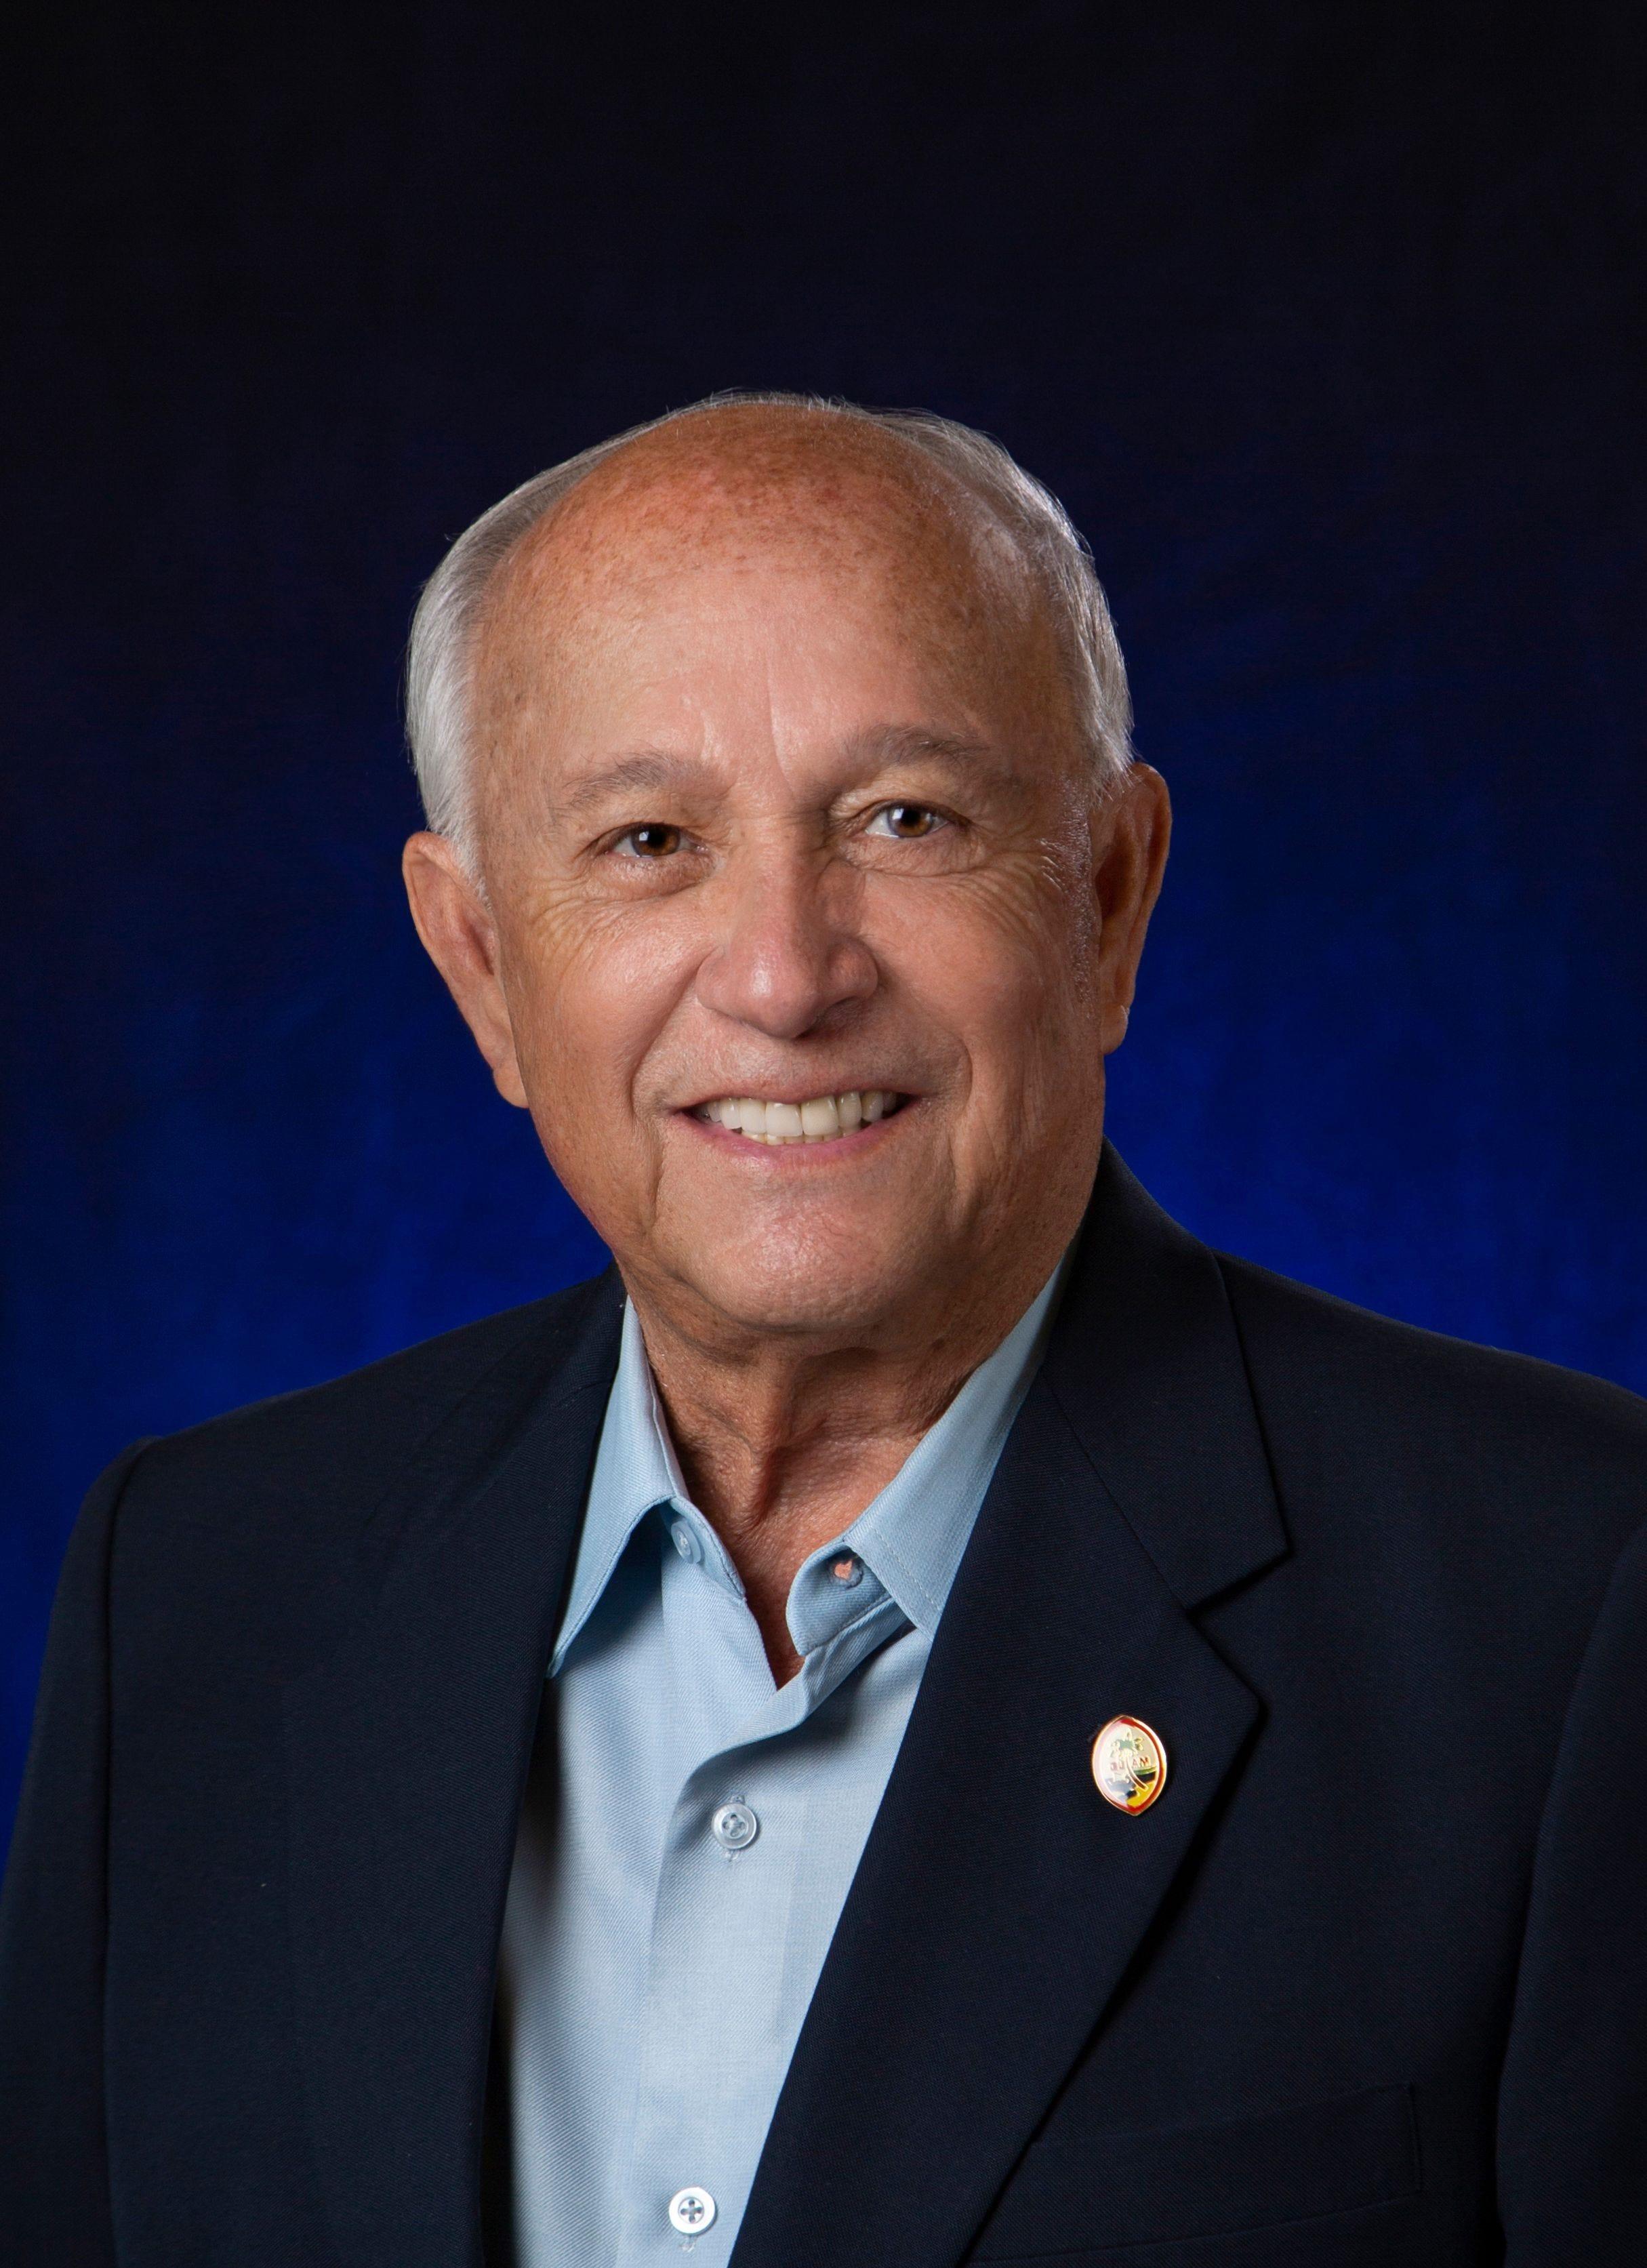 Carl T.C. Gutierrez